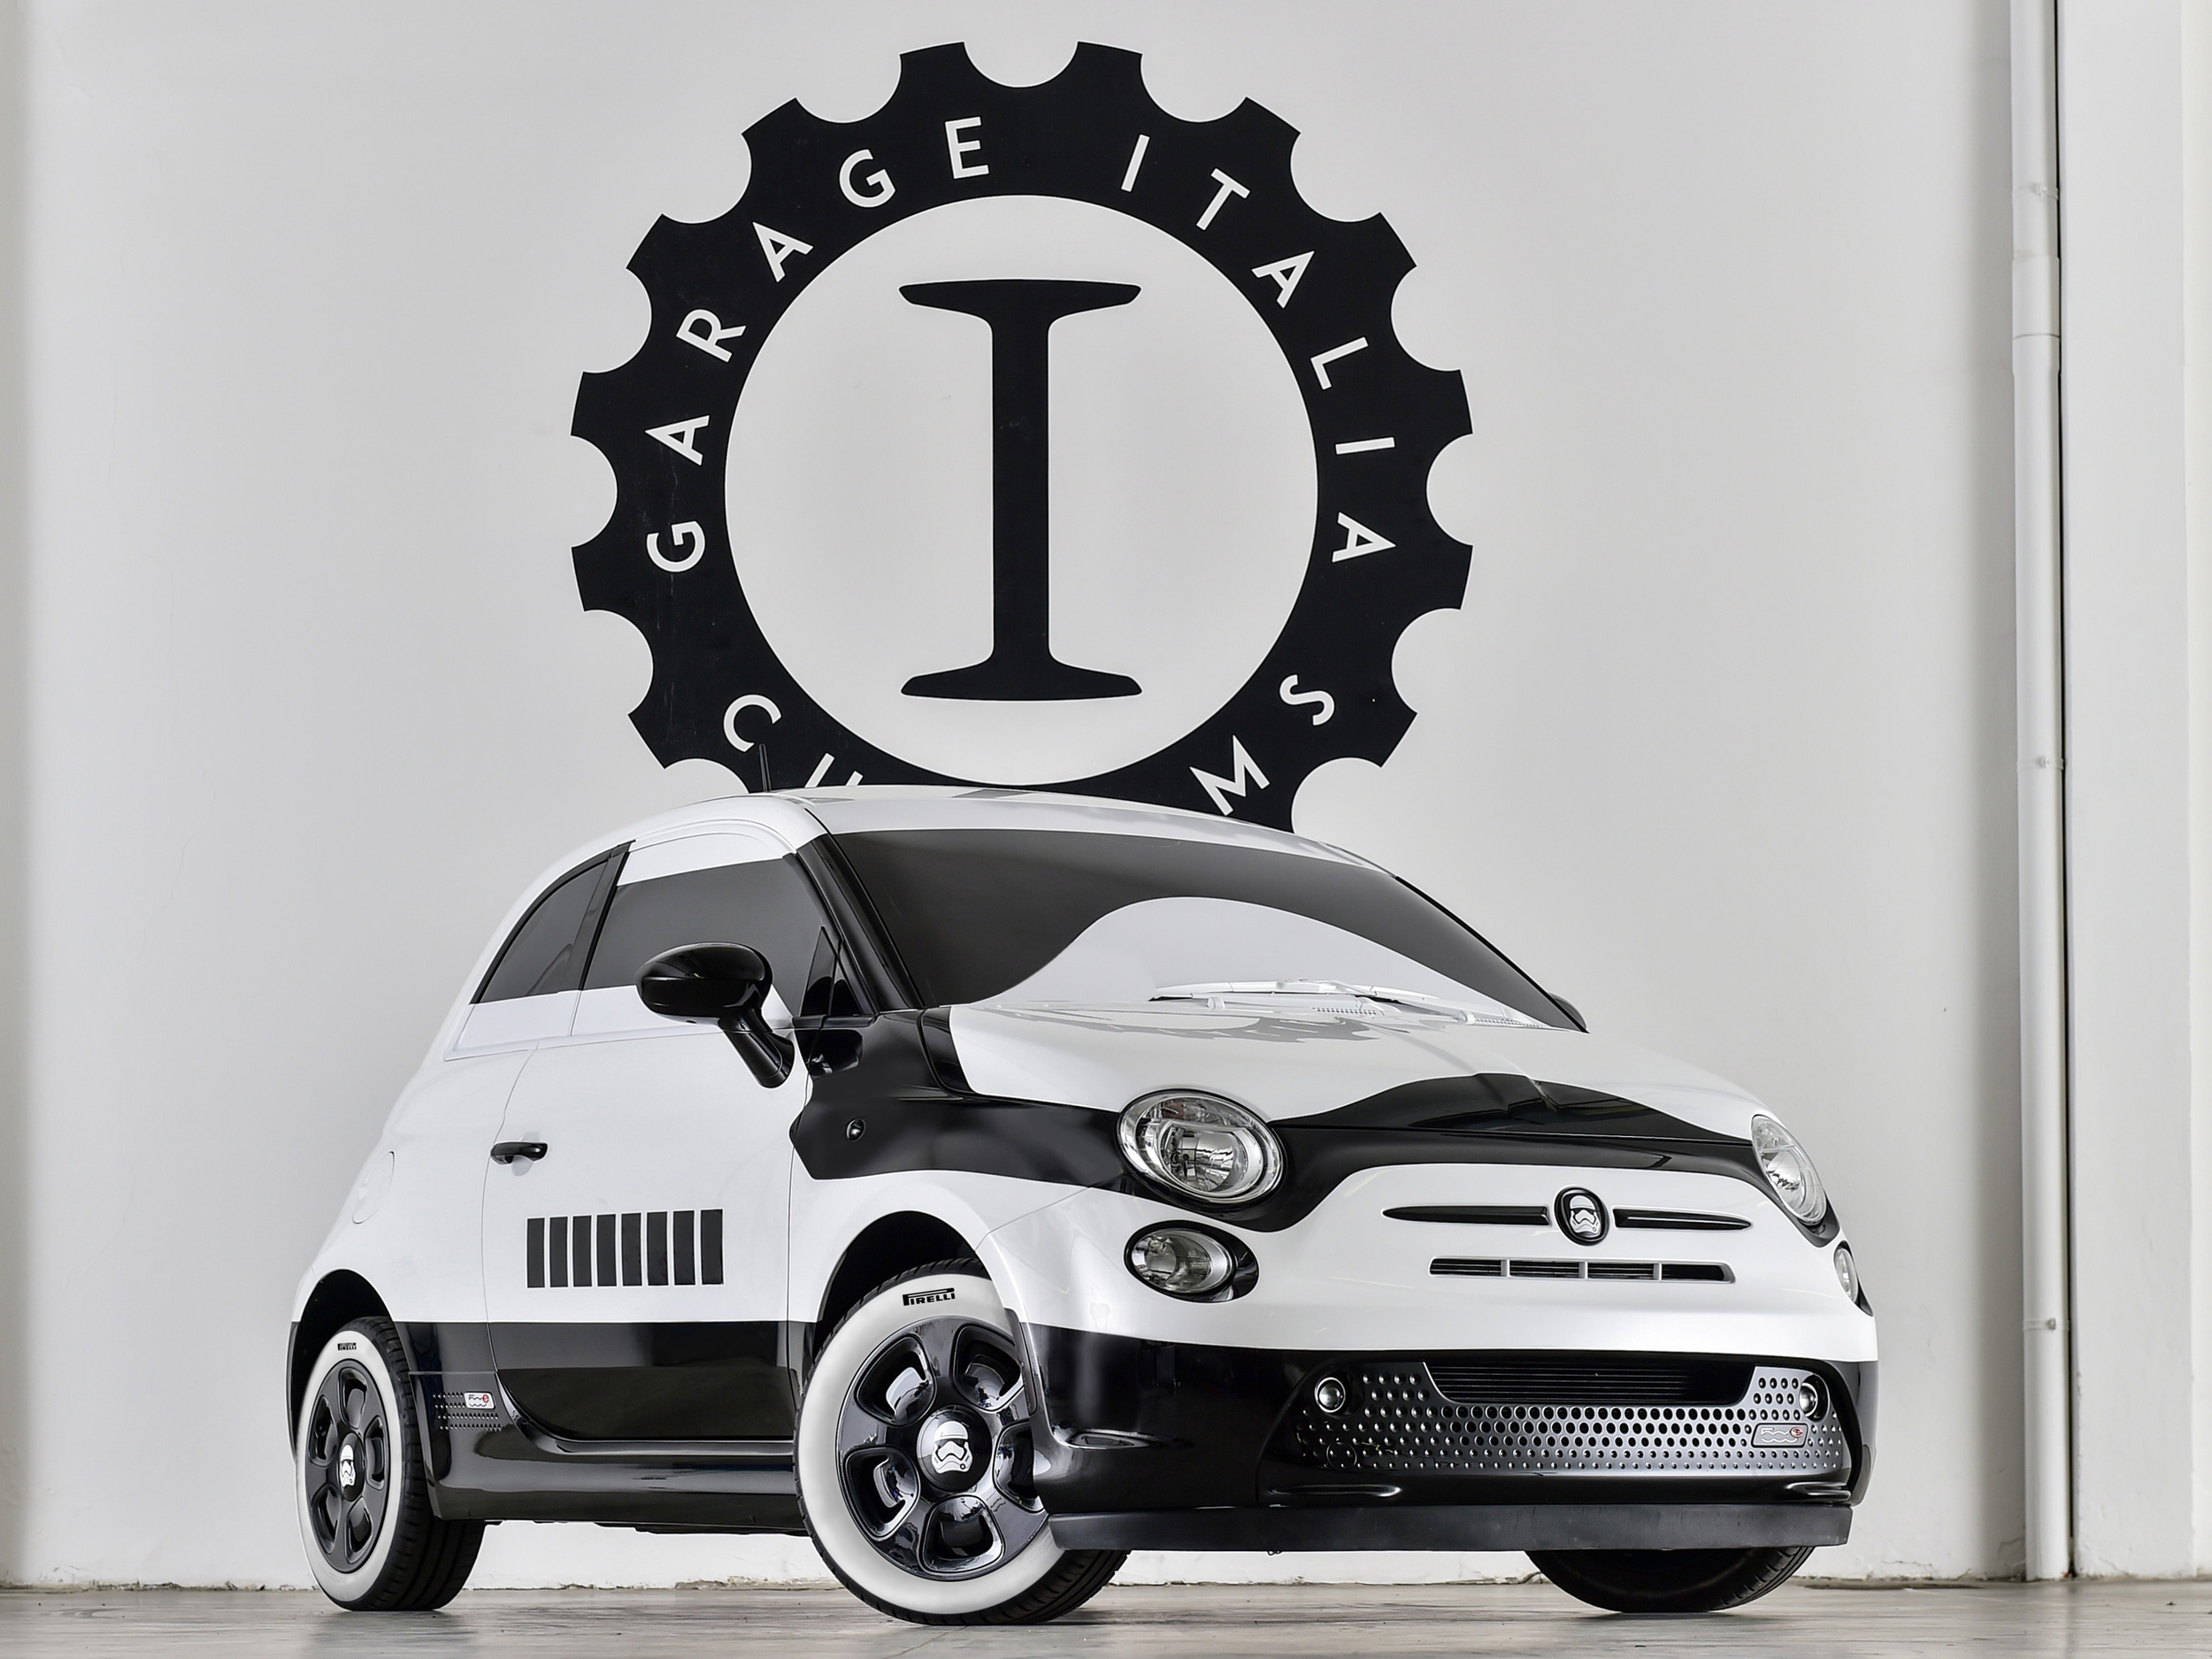 Fiat_500e_stormtrooper2iq3n9ll6mcj0v388l3ga4mk7p6.jpg